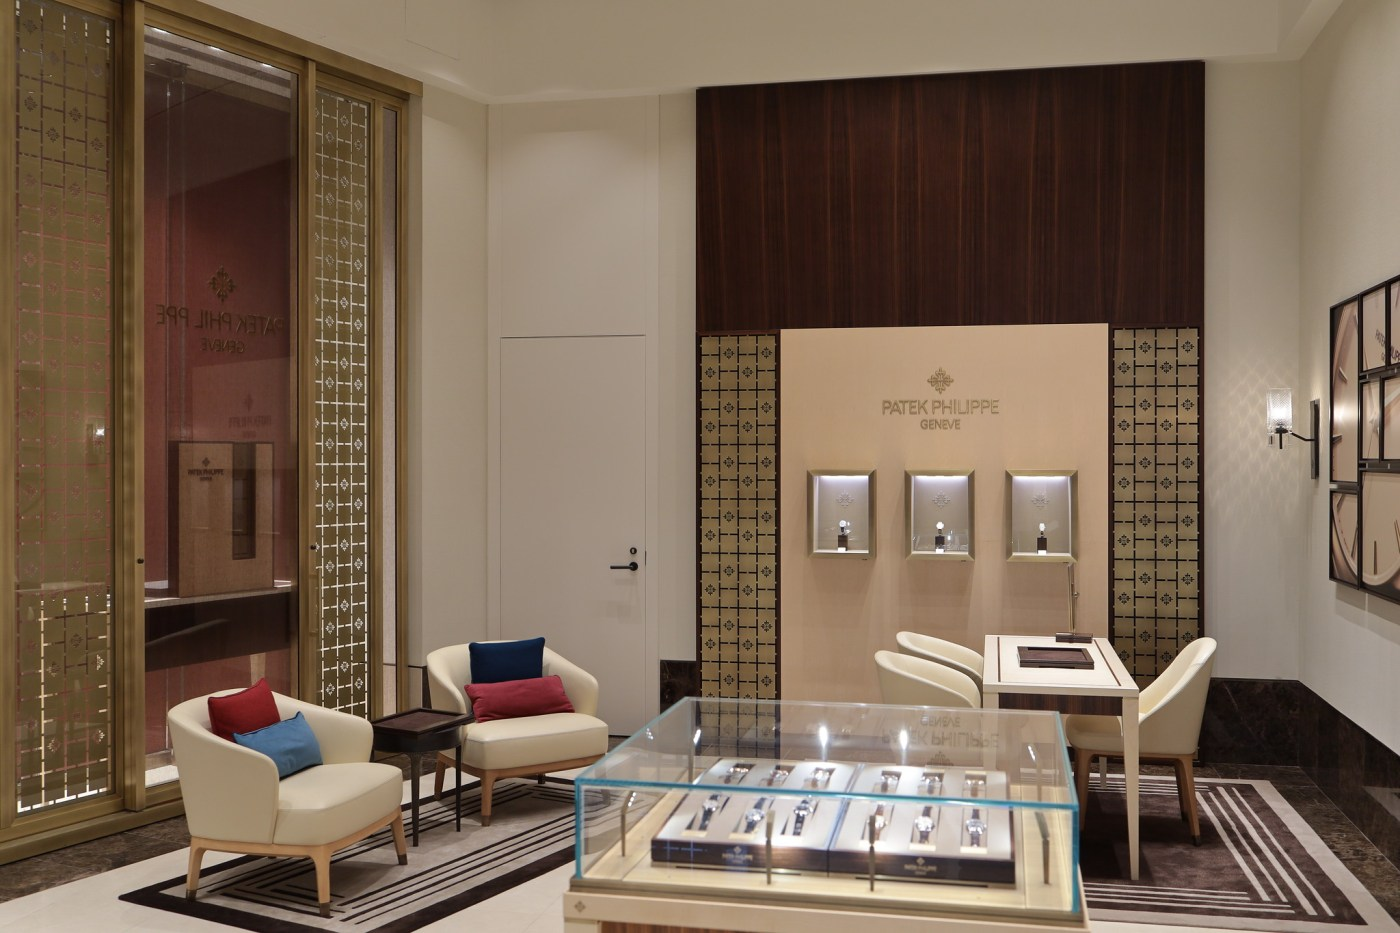 Dedicated Patek Philippe boutique-within-Watches of Switzerland Hudson Yards 2019